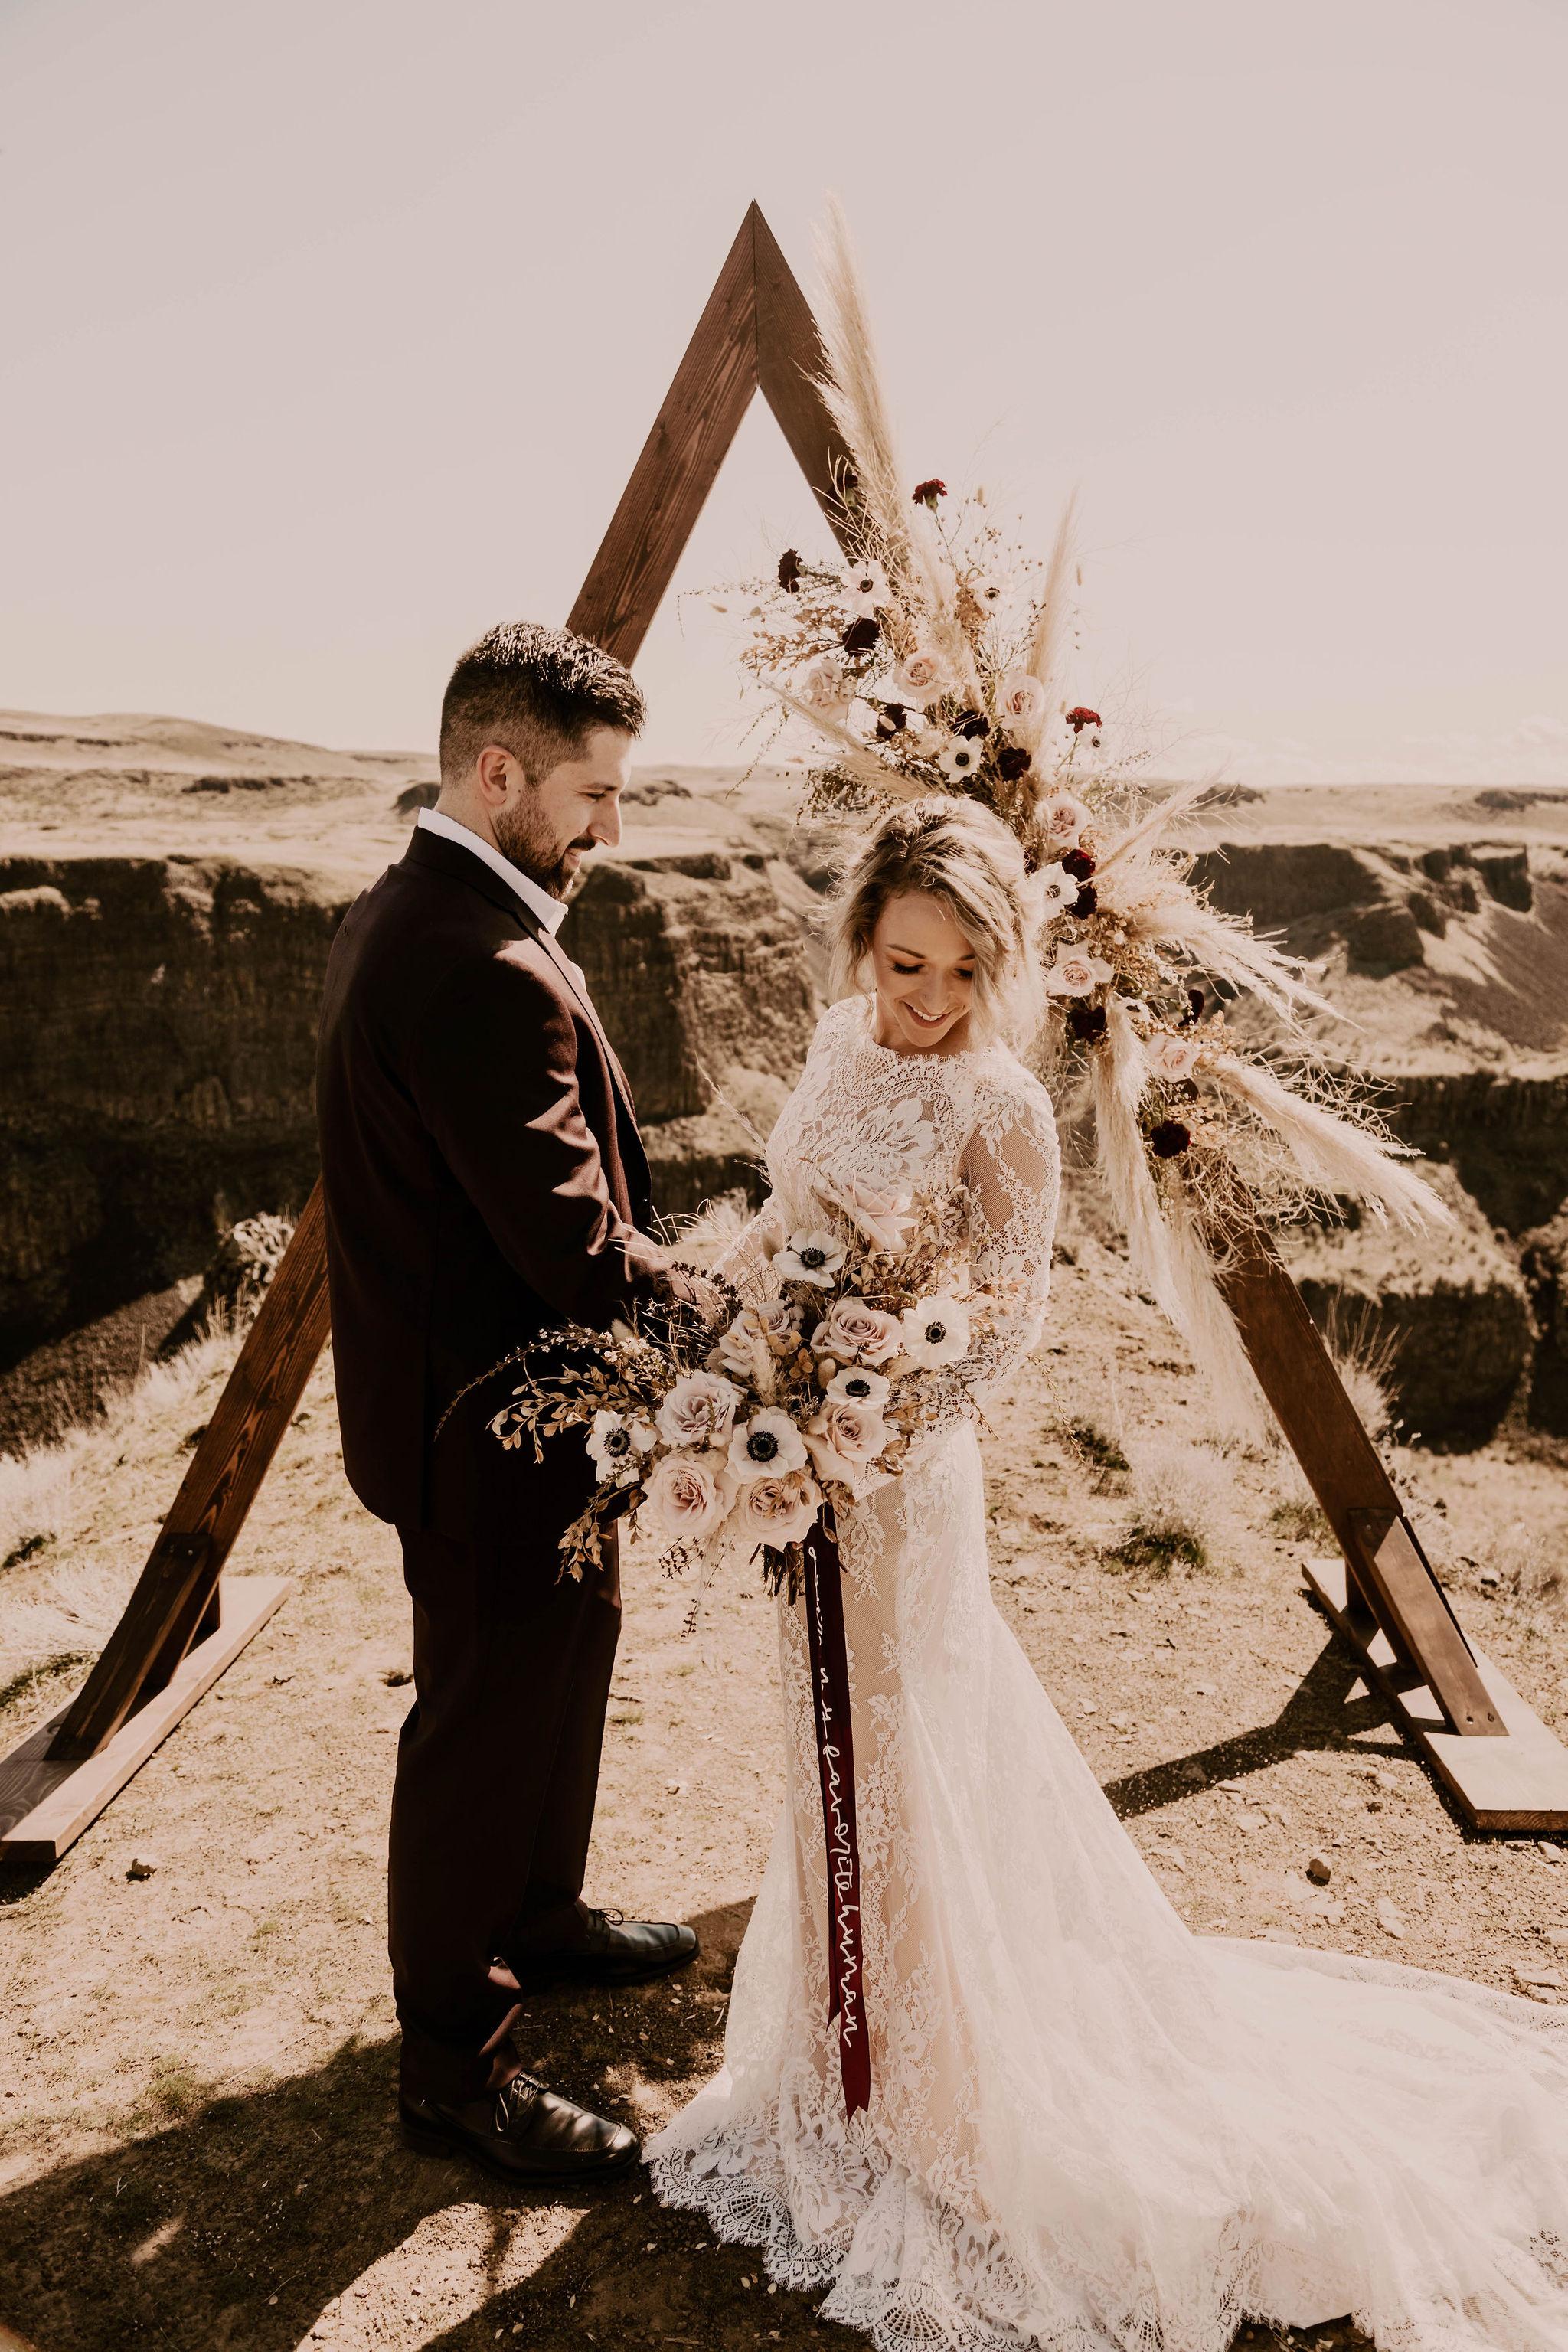 spokane destination wedding wooden arch bride